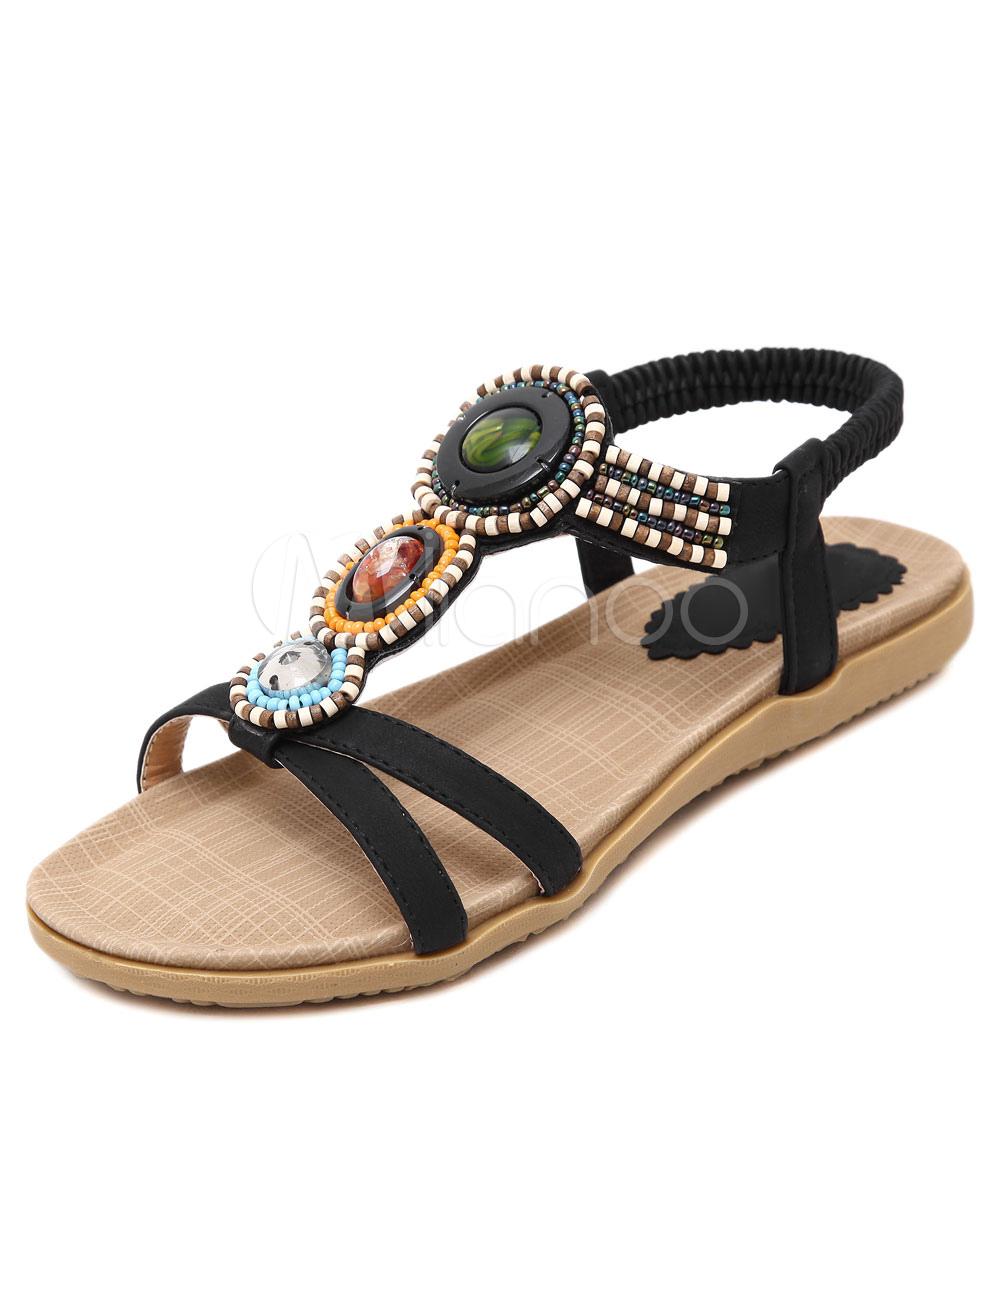 Milanoo / Bohemian Black Flats Beaded PU Sandals for Women